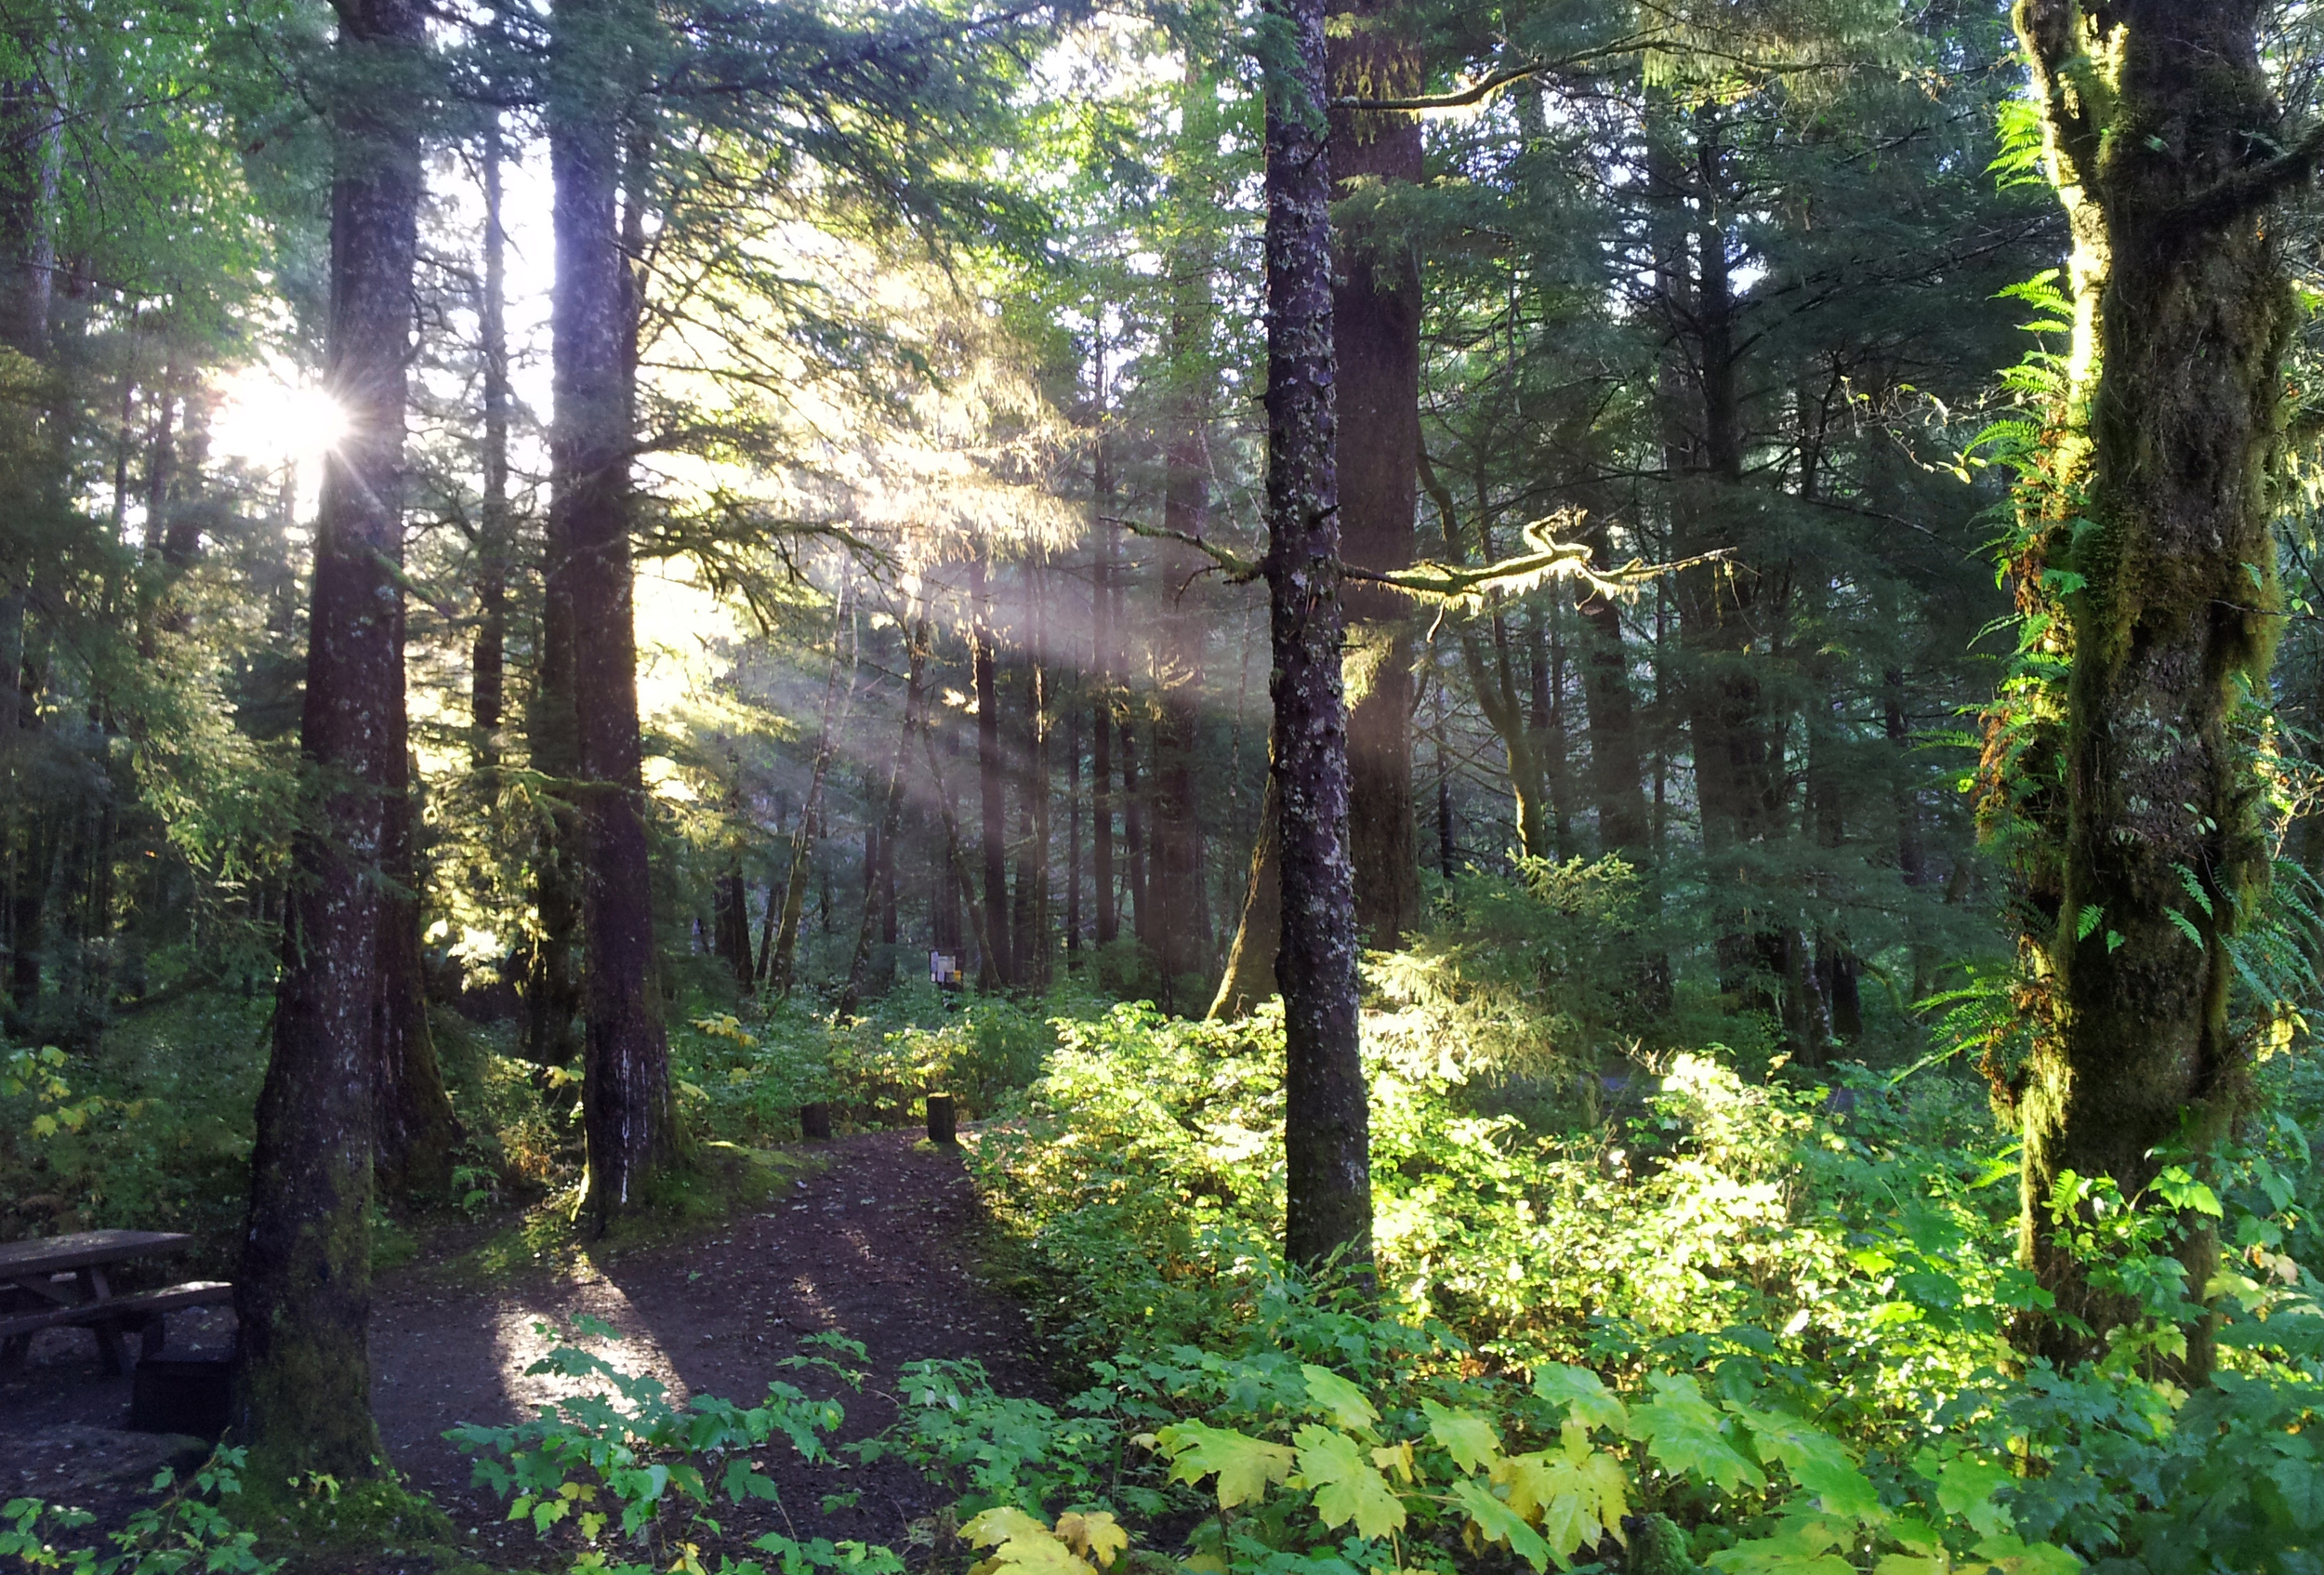 The beautiful, rainy rainforest of Southeast Alaska.